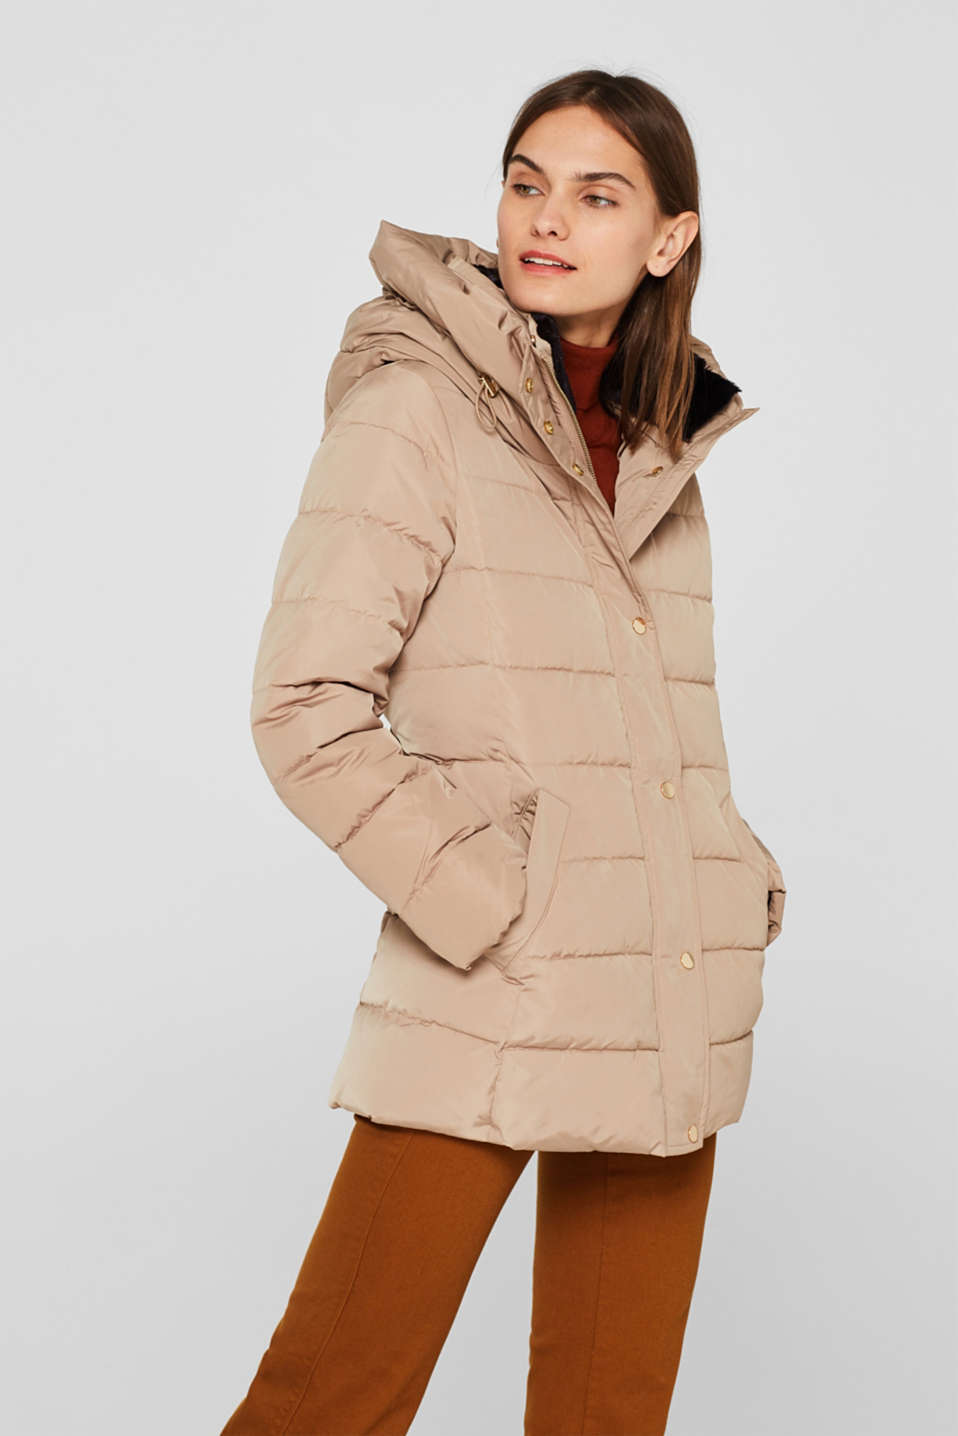 Jackets outdoor woven, SKIN BEIGE, detail image number 4